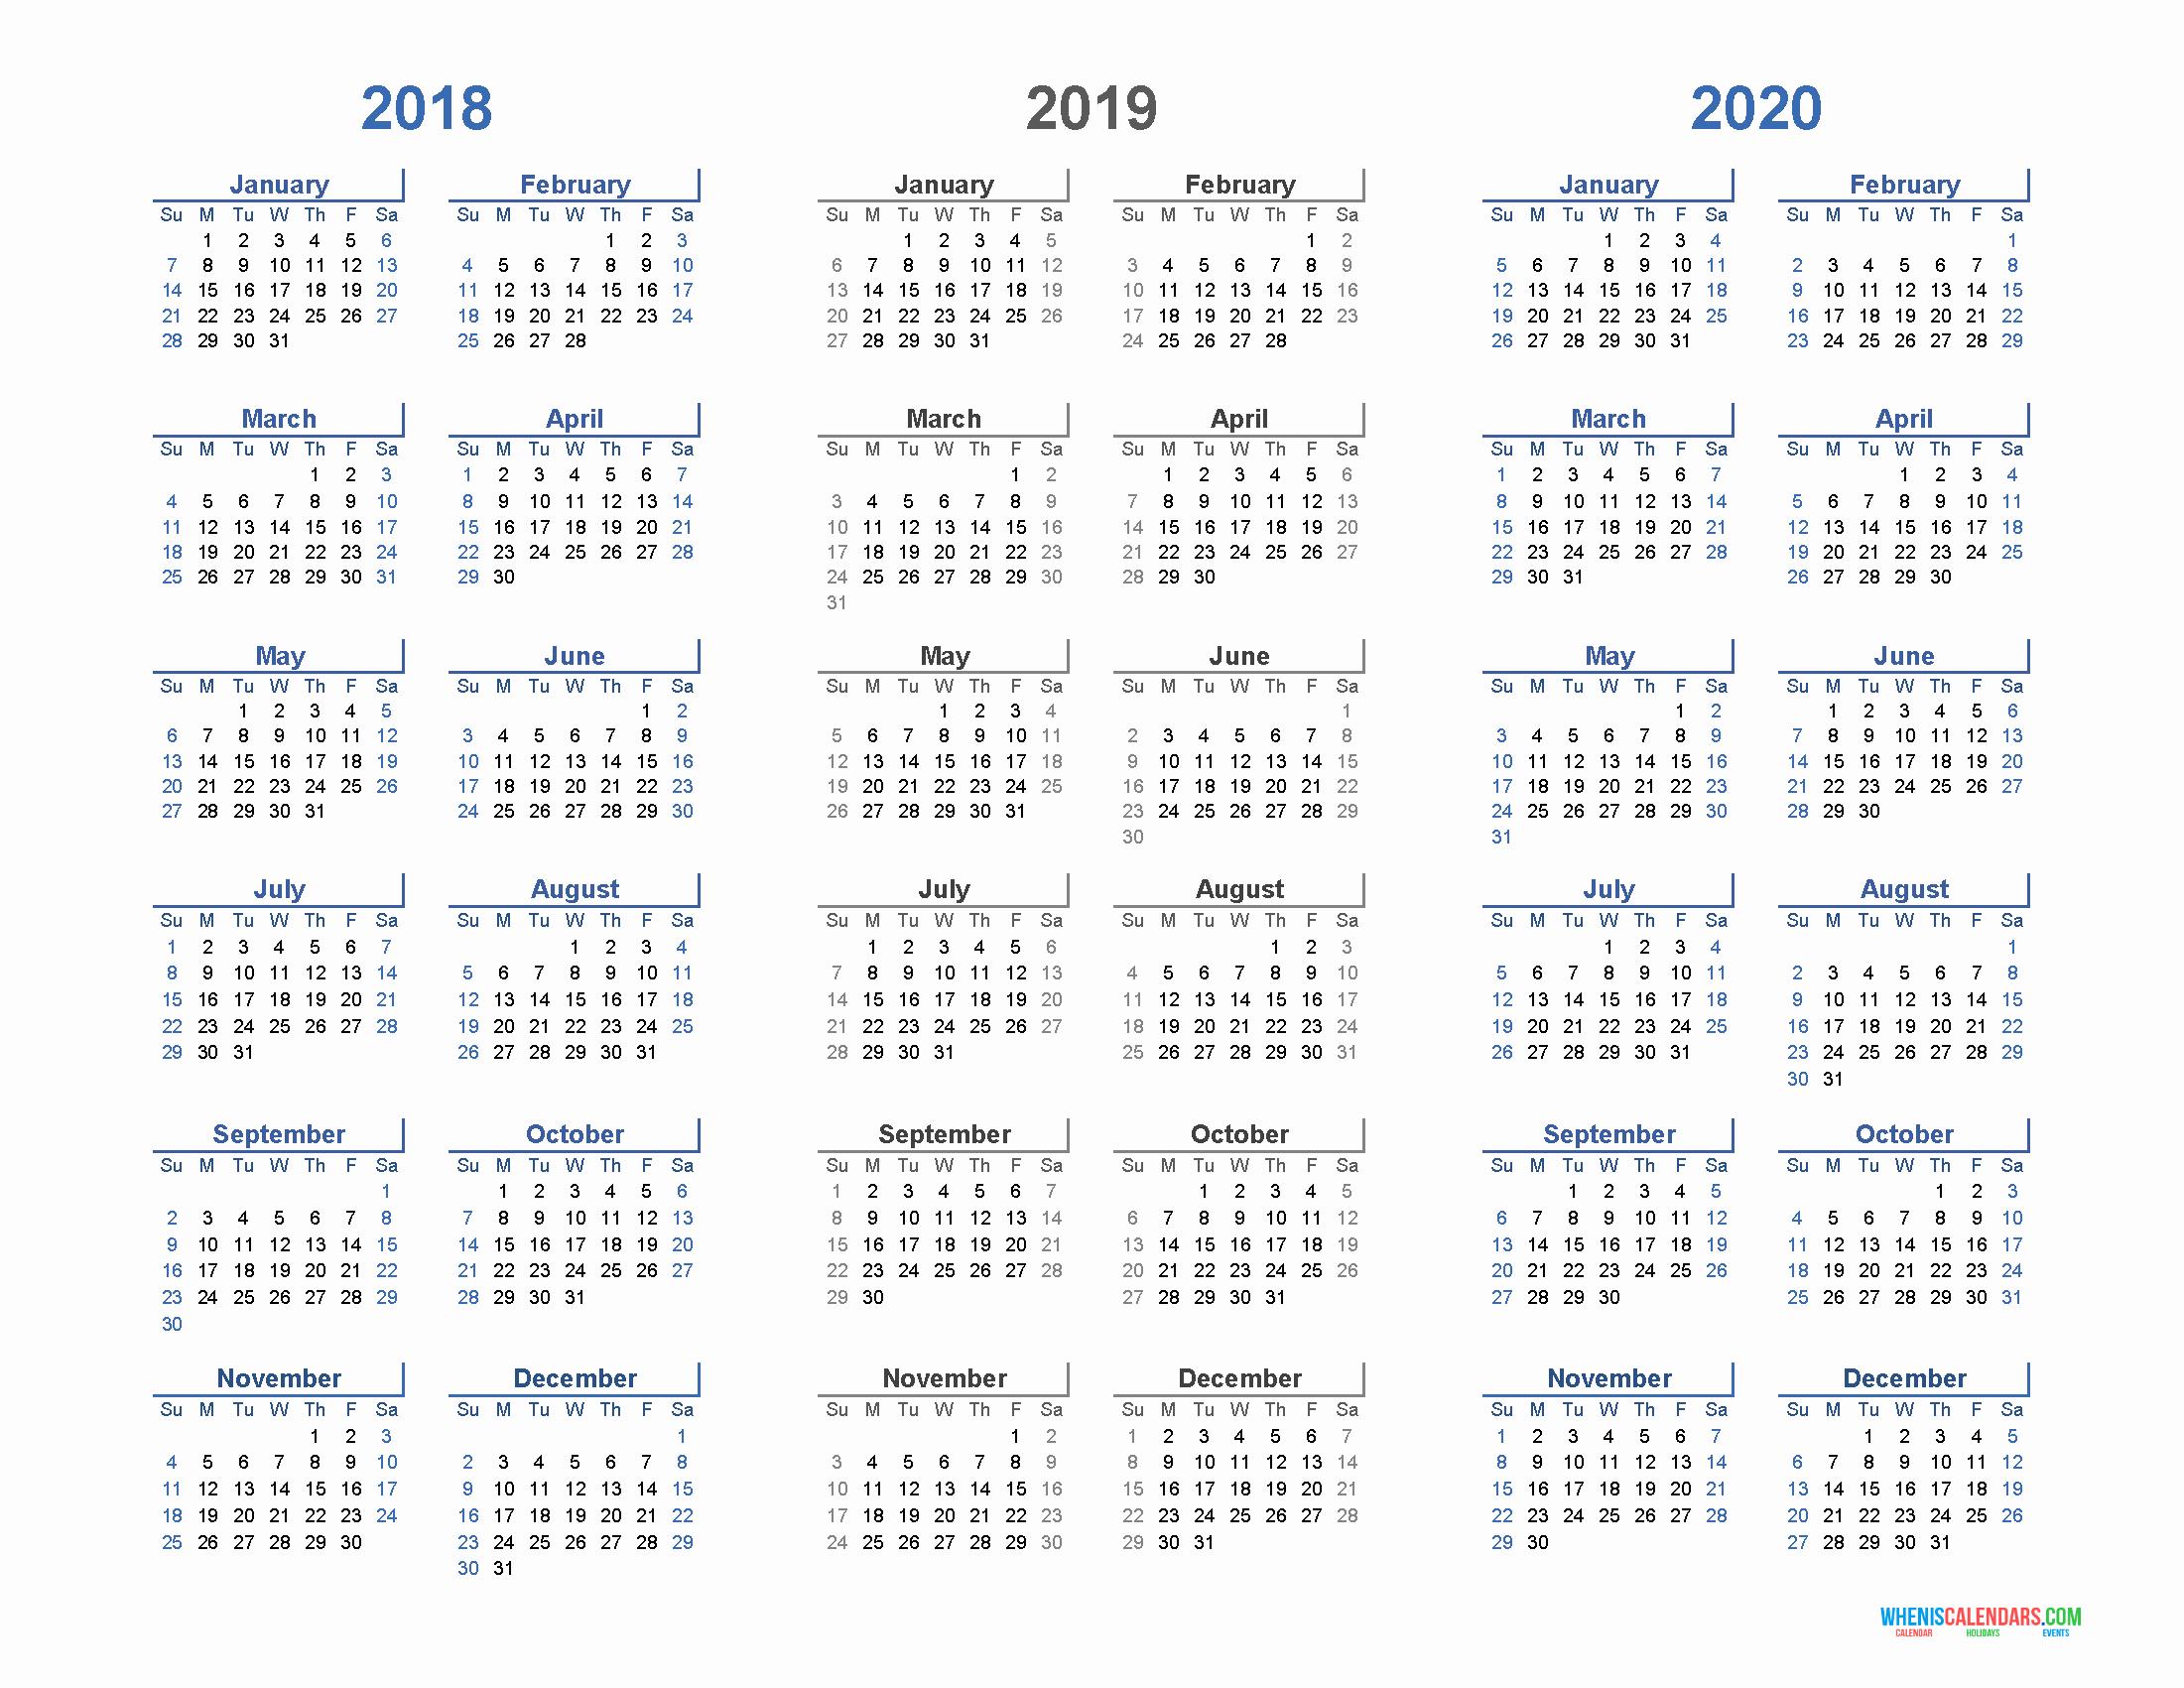 2019 and 2020 Calendar Printable Best Of Printable Calendar 2018 2019 and 2020 3 Year Calendar